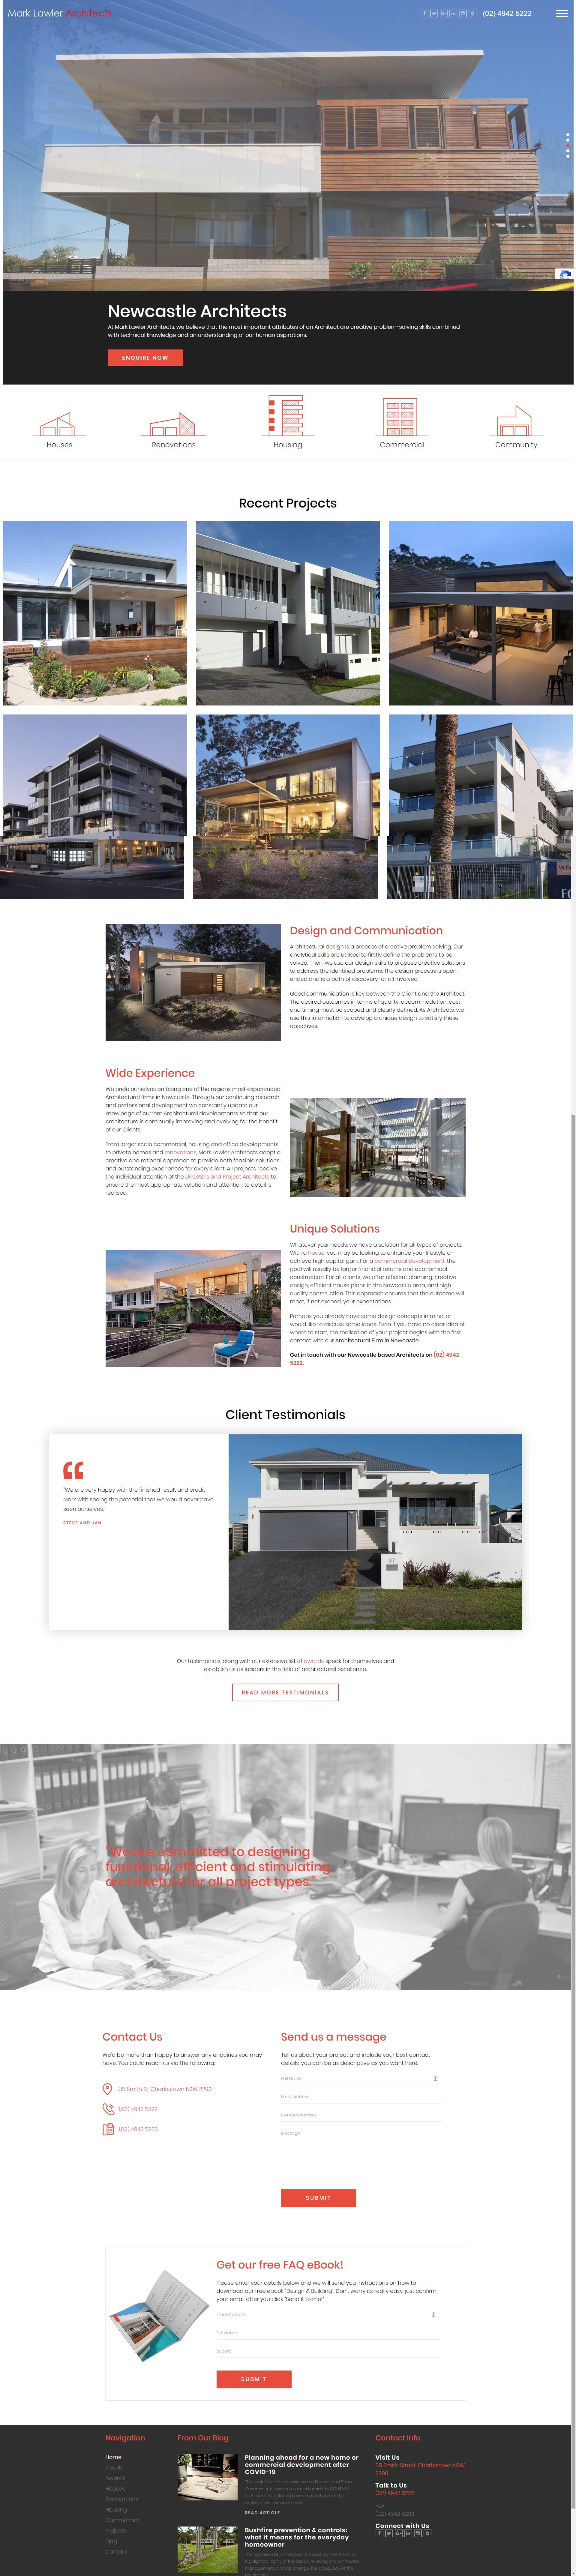 Mark Lawler Architects -